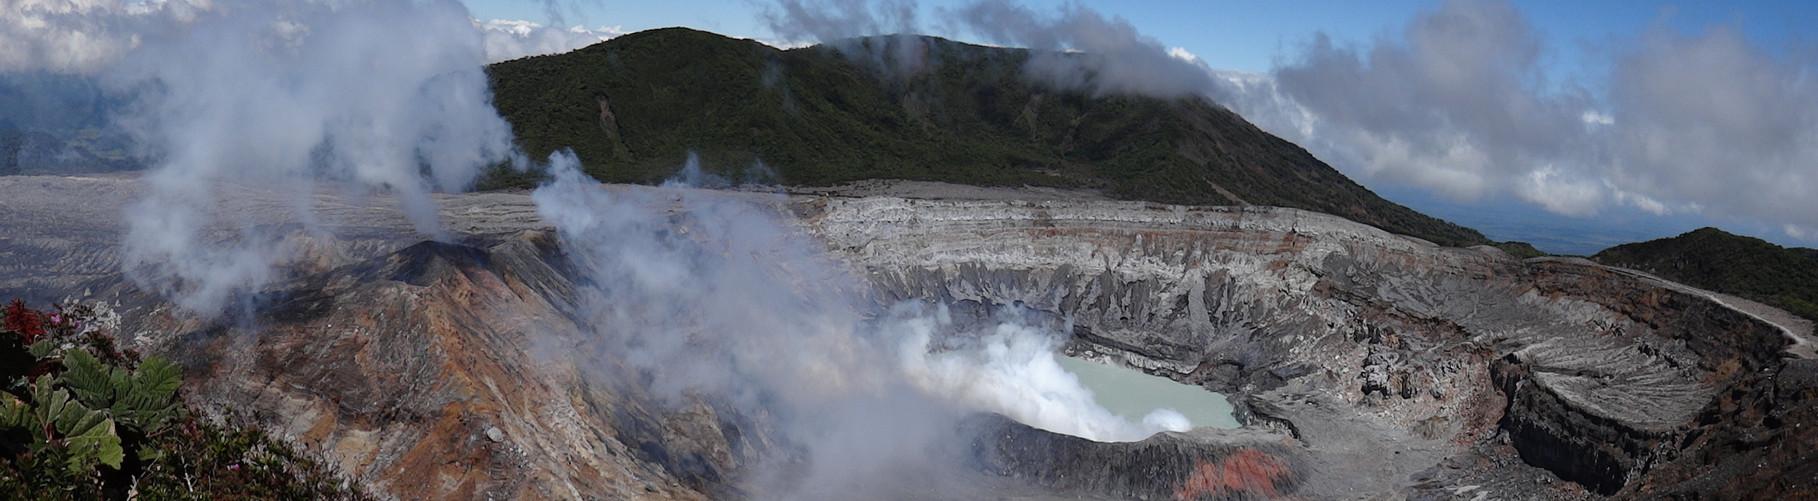 Erstes Etappenziel der Rundreise: der Vulkan Poas...